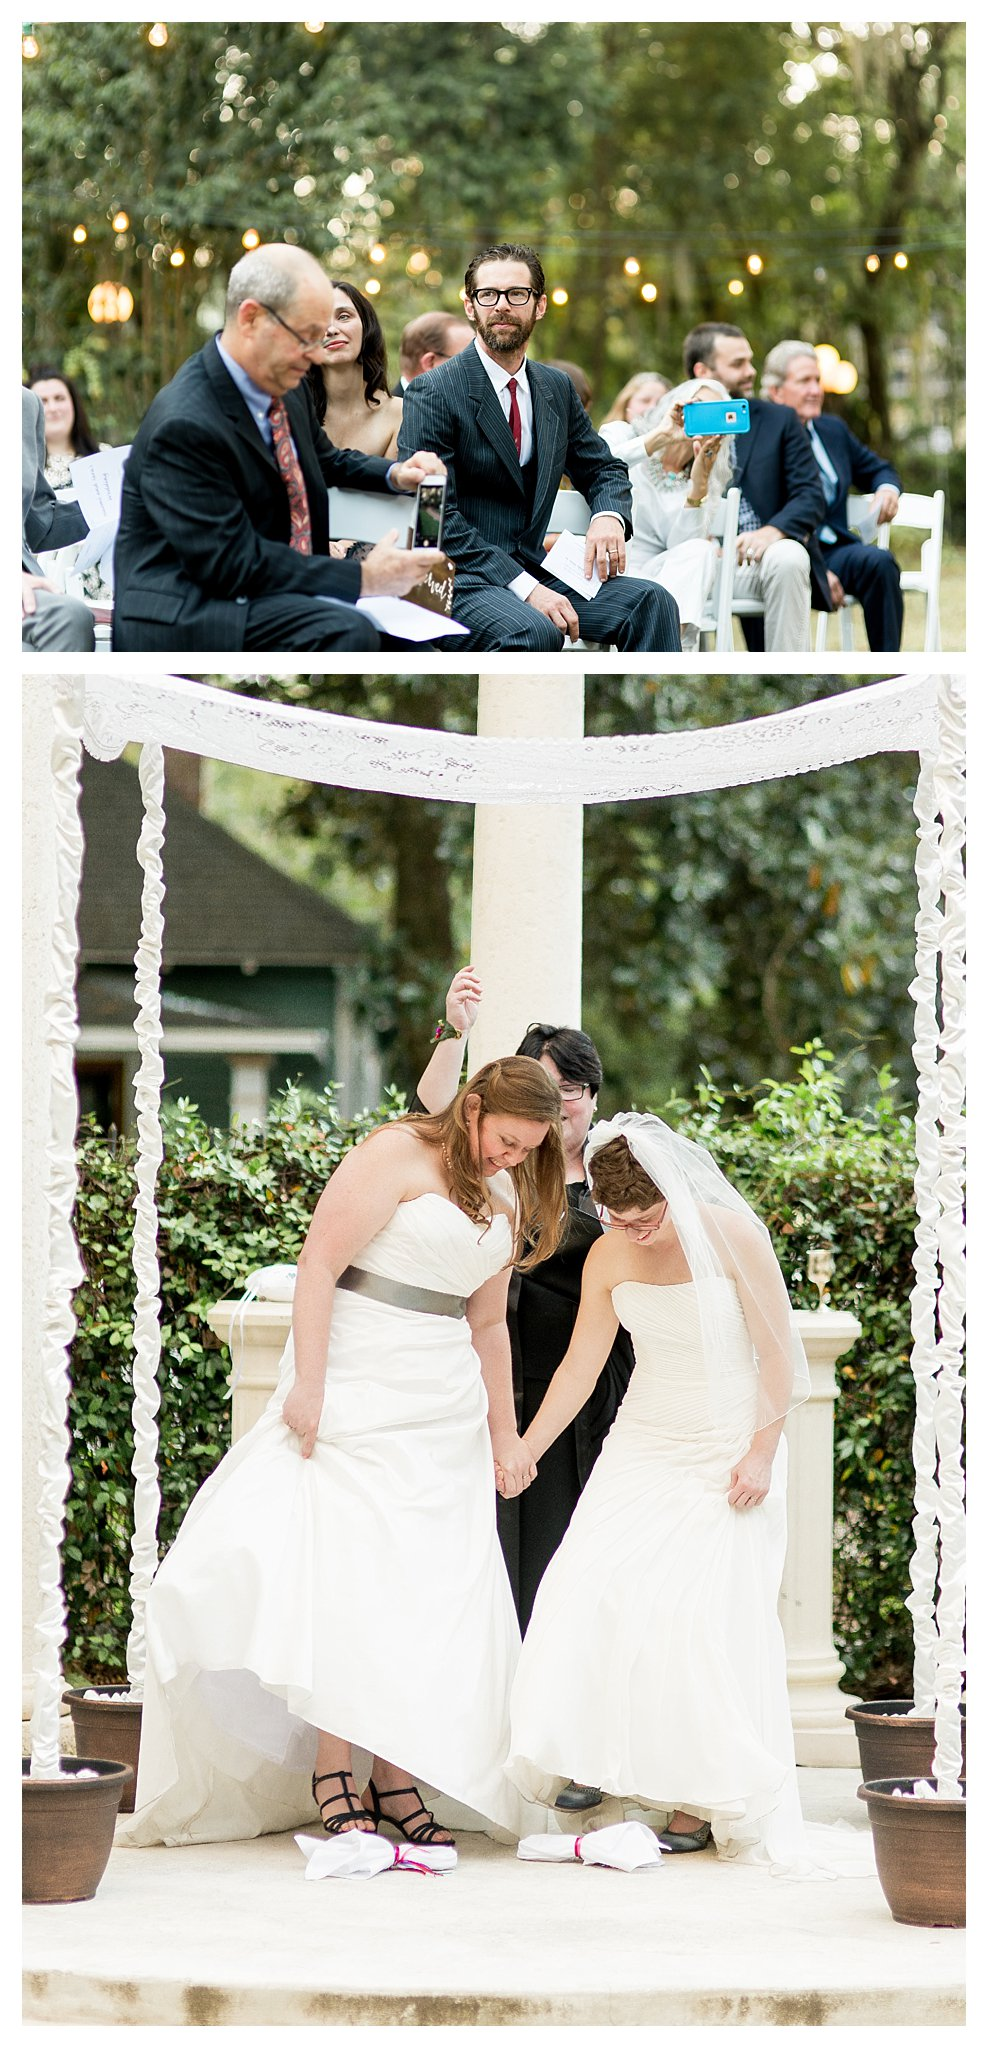 everleigh-photography-cincinnati-wedding-photographer-cincinnati-wedding-photography-sweetwater-branch-inn-gainesville-florida-wedding-36